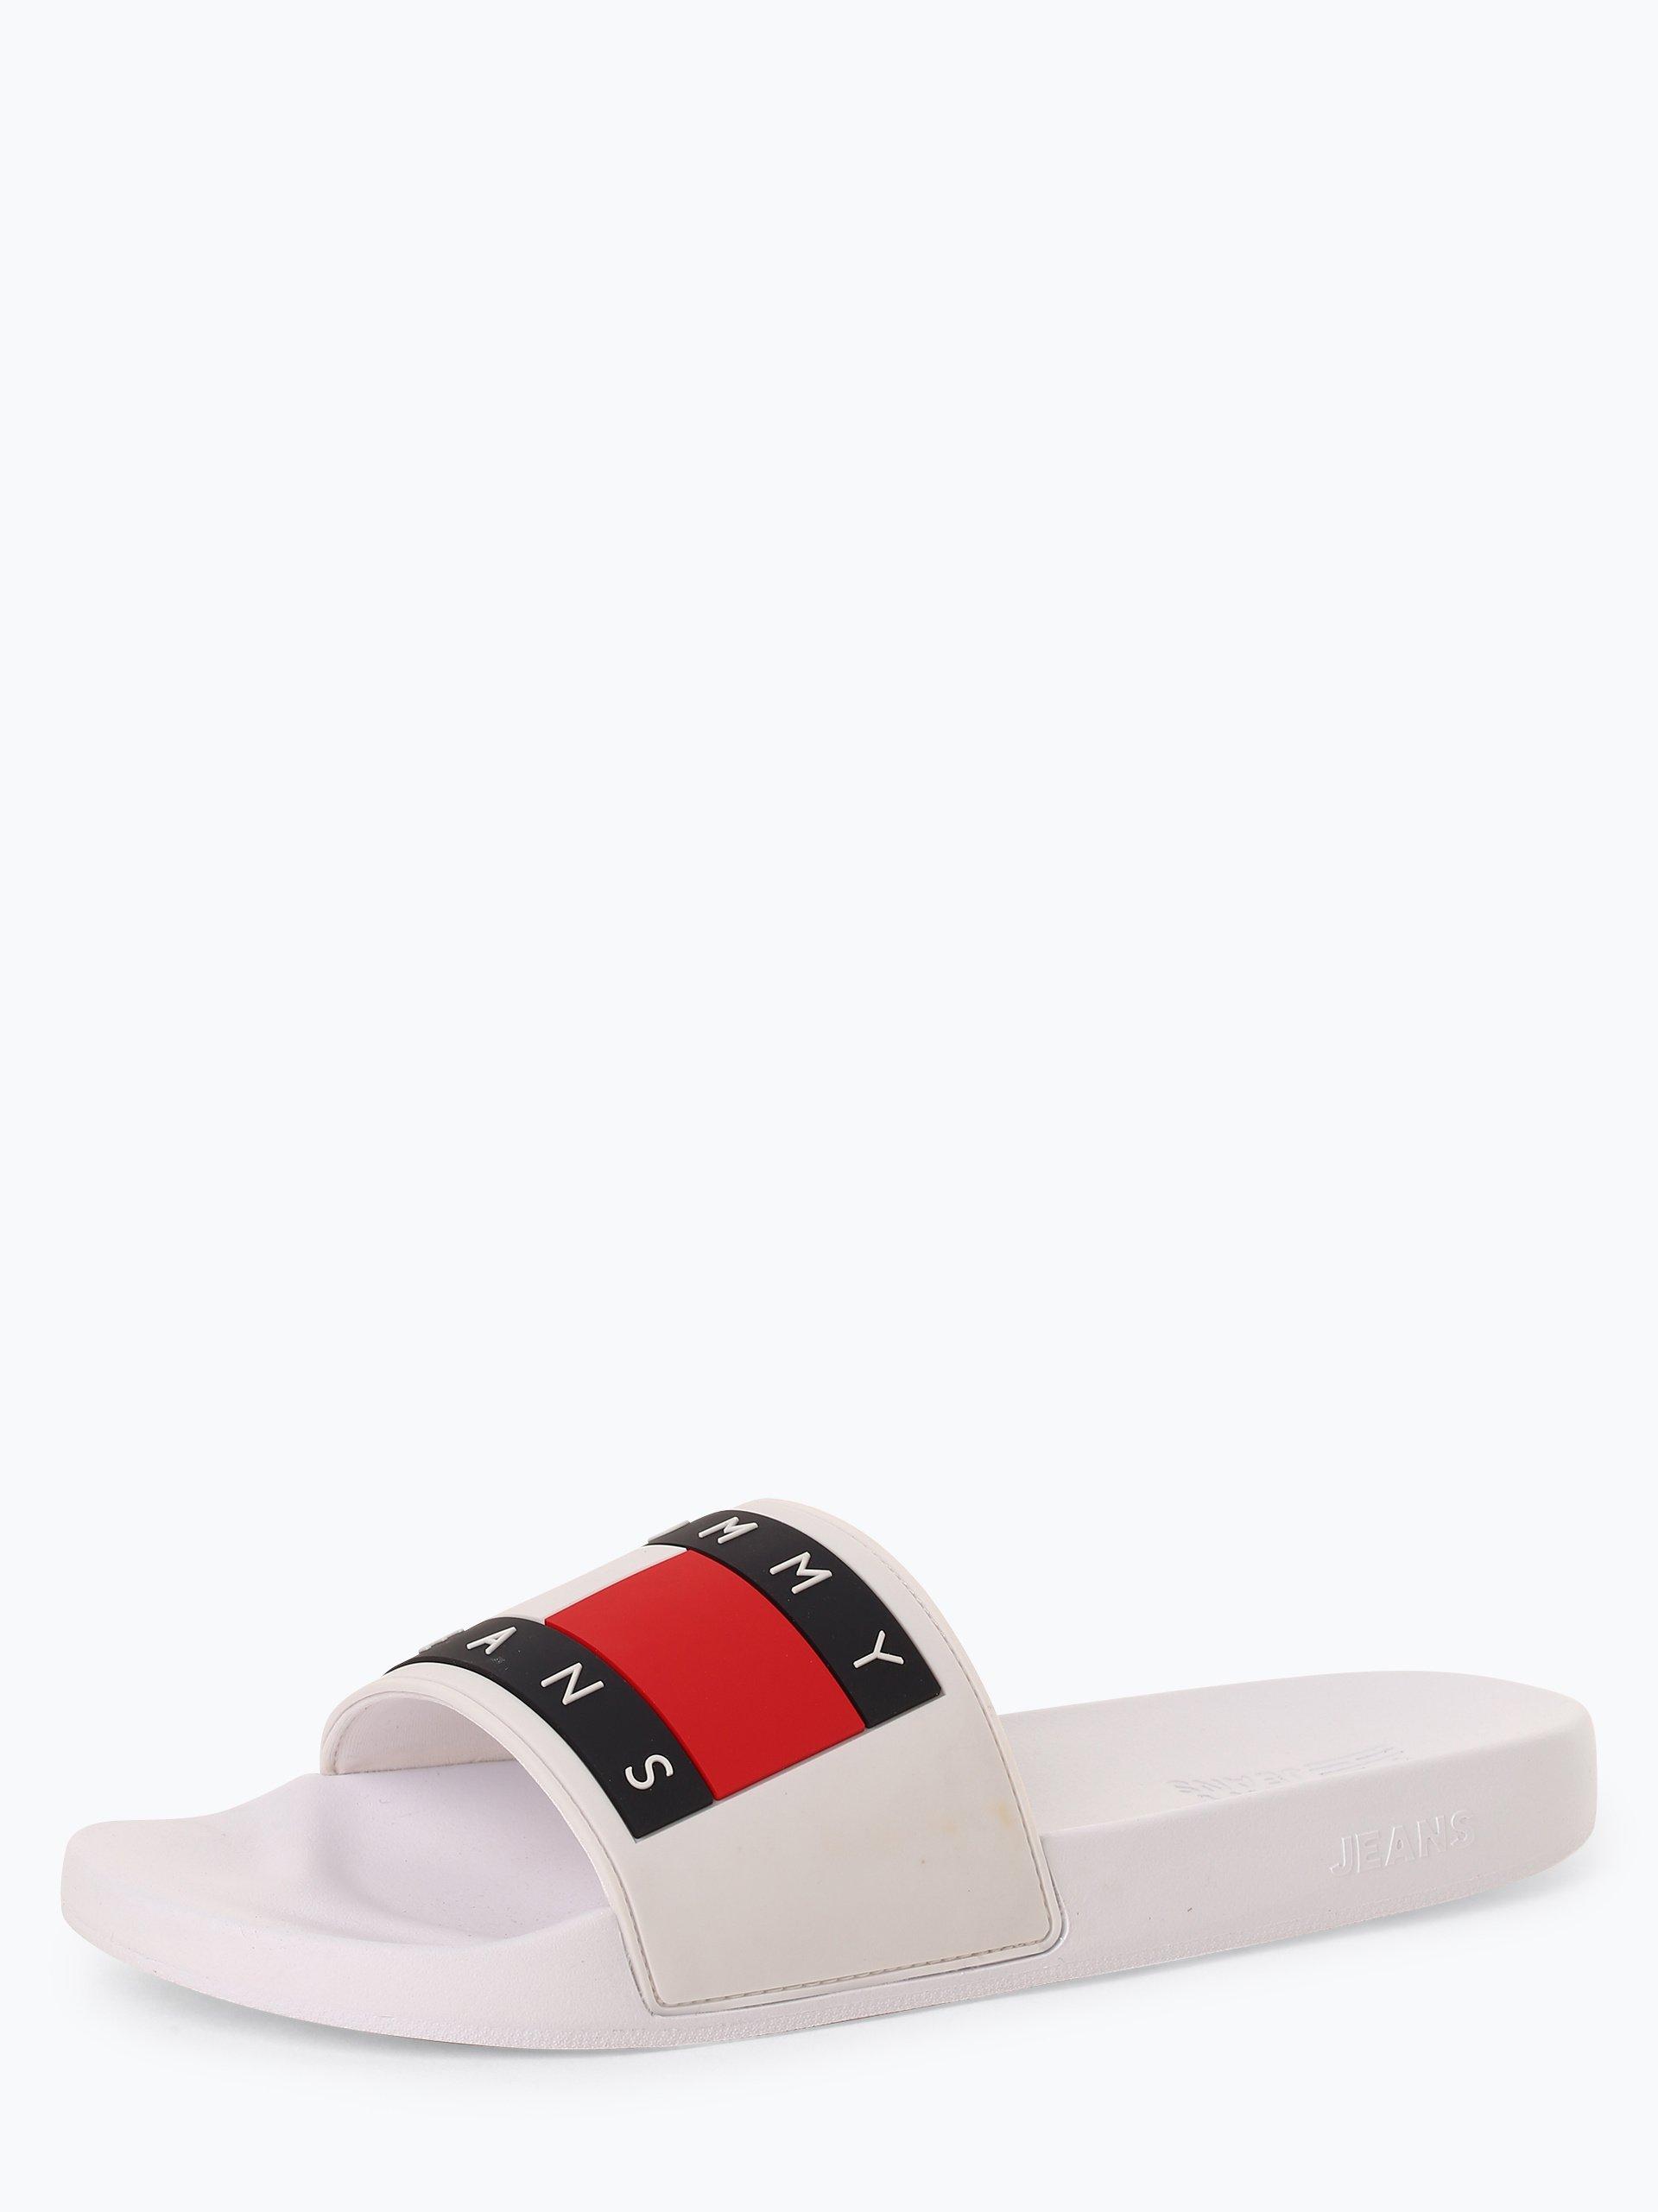 Tommy Jeans Męskie pantofle kąpielowe